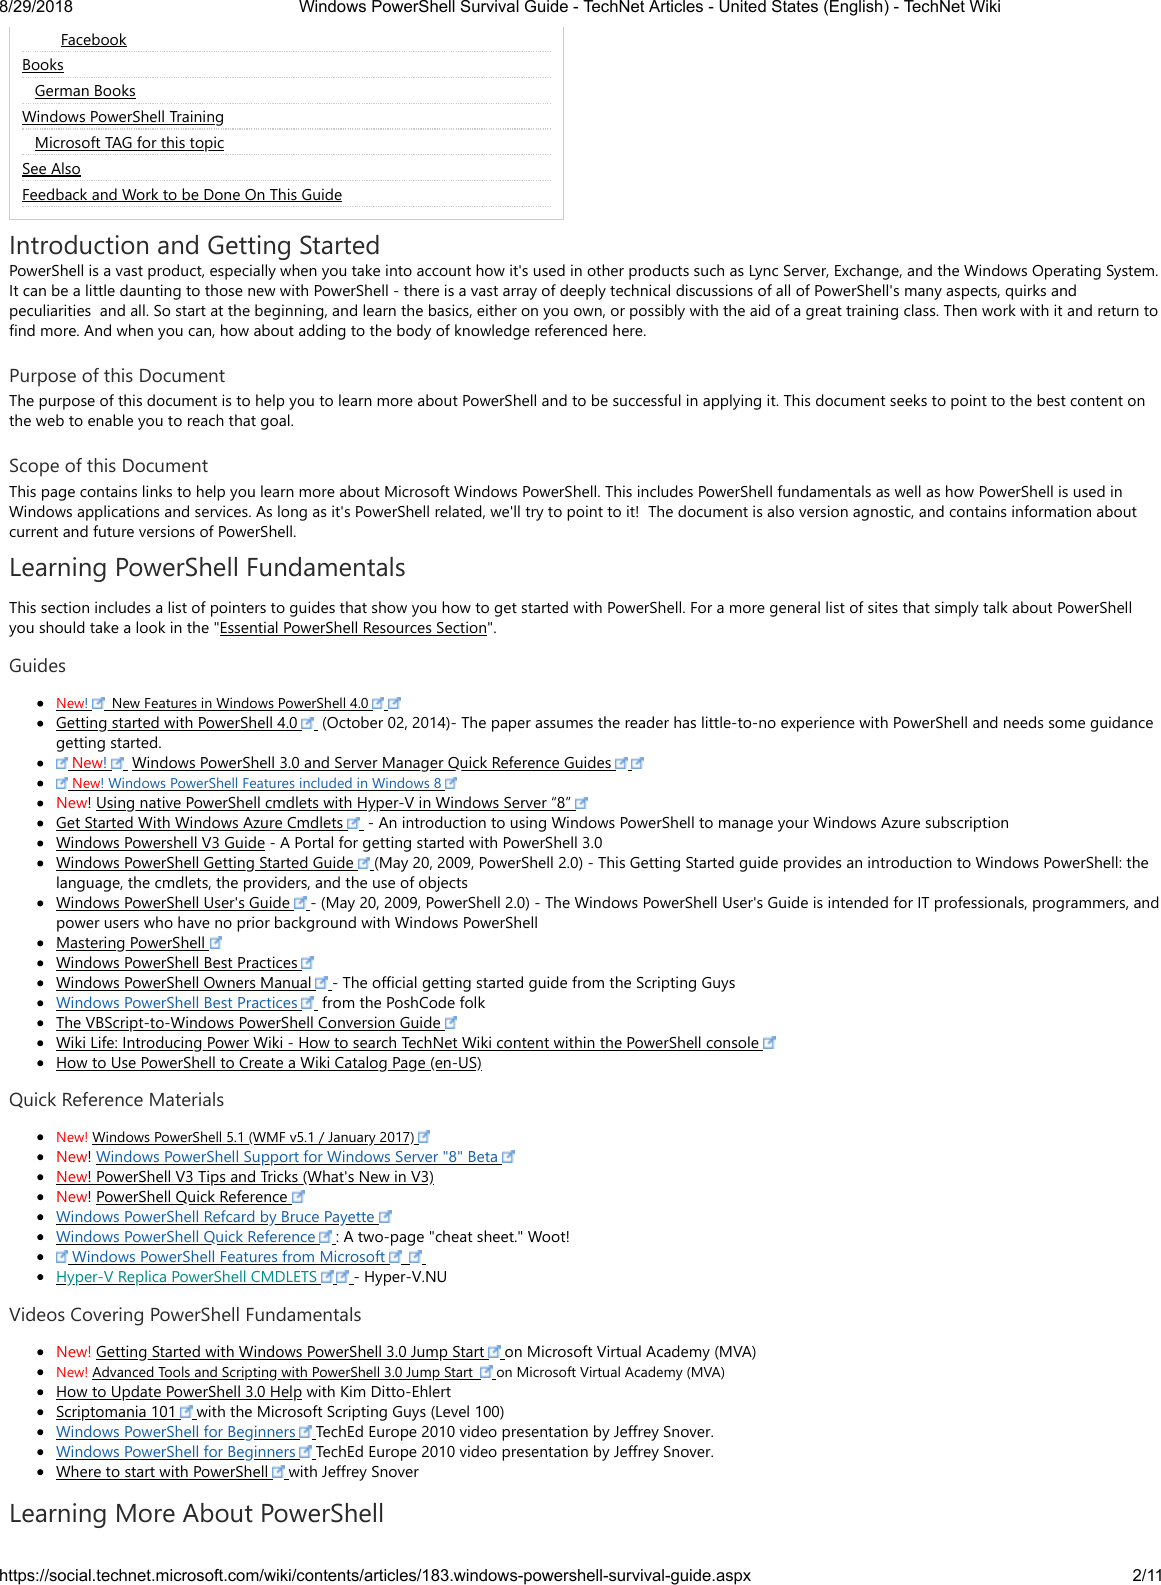 Windows Power Shell Survival Guide Tech Net Articles